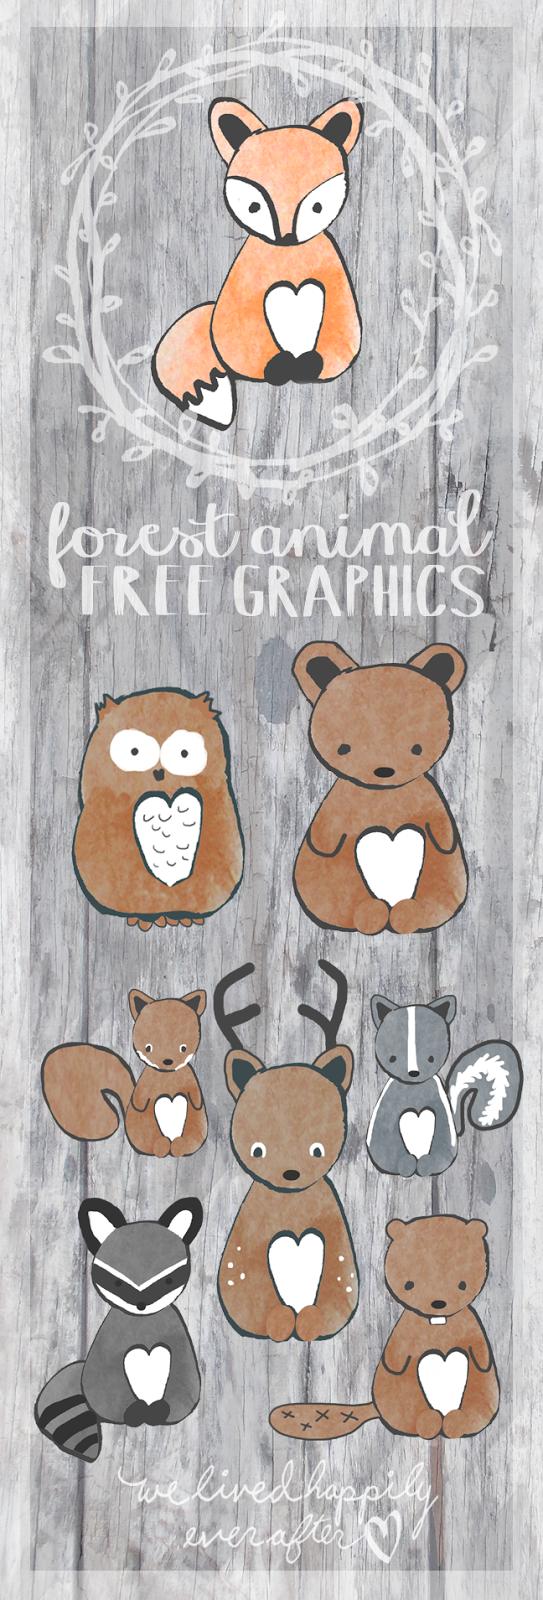 Kinderzimmer wanddekor free forest animal clip art graphics we lived happily ever after